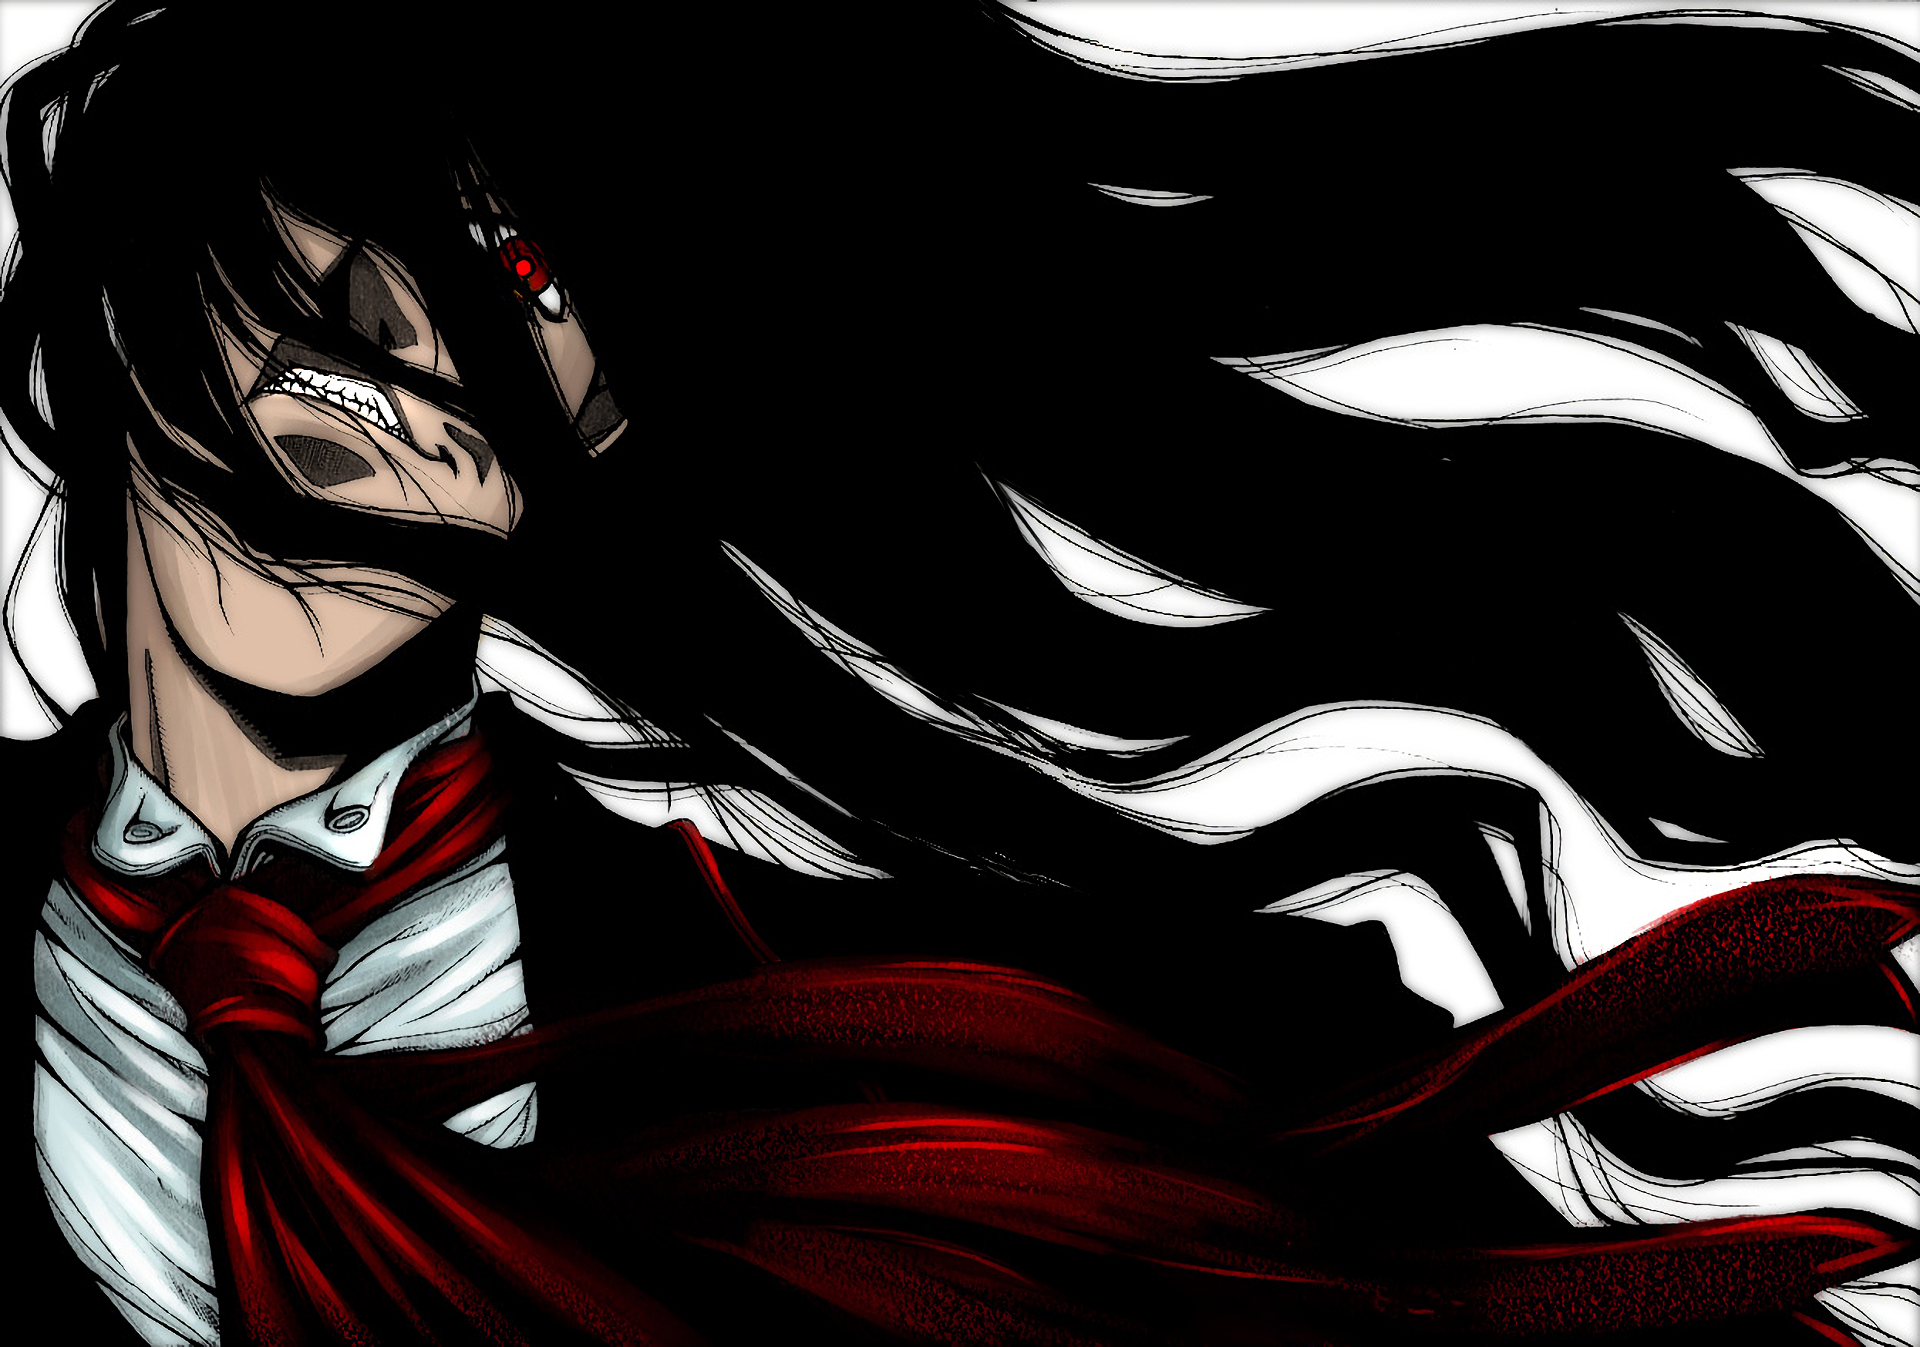 Anime - Hellsing  Alucard (Hellsing) Wallpaper